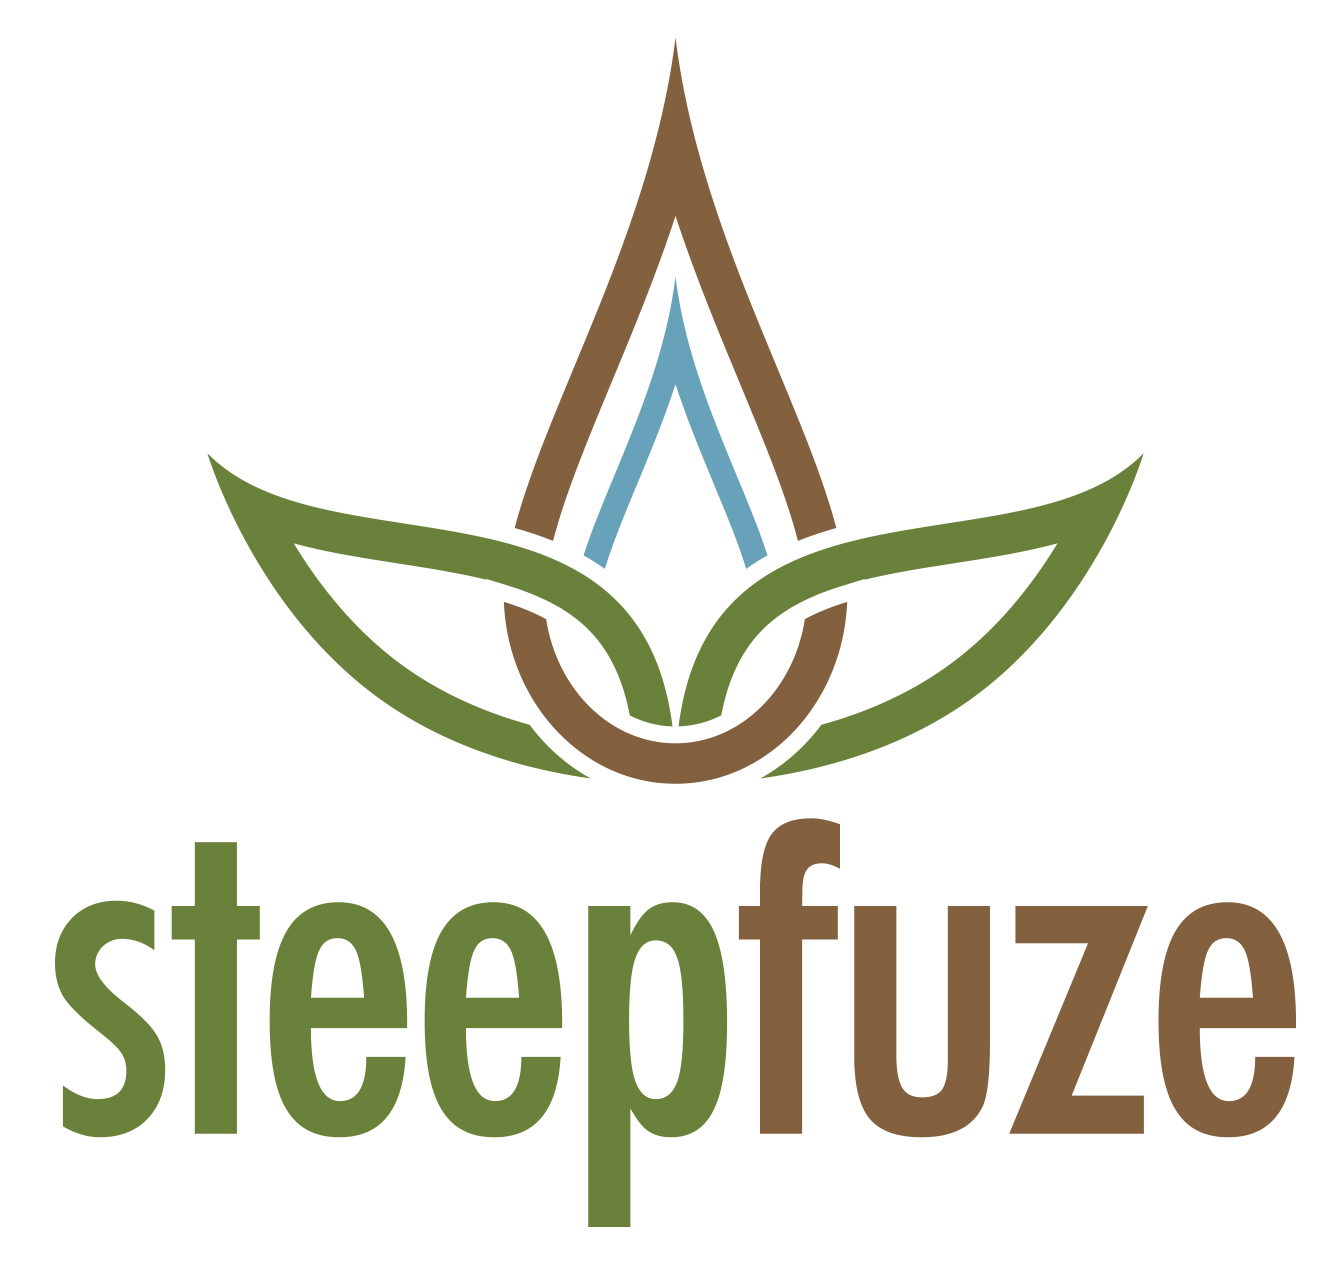 Steep Fuze - Hospitality Suite Sponsor